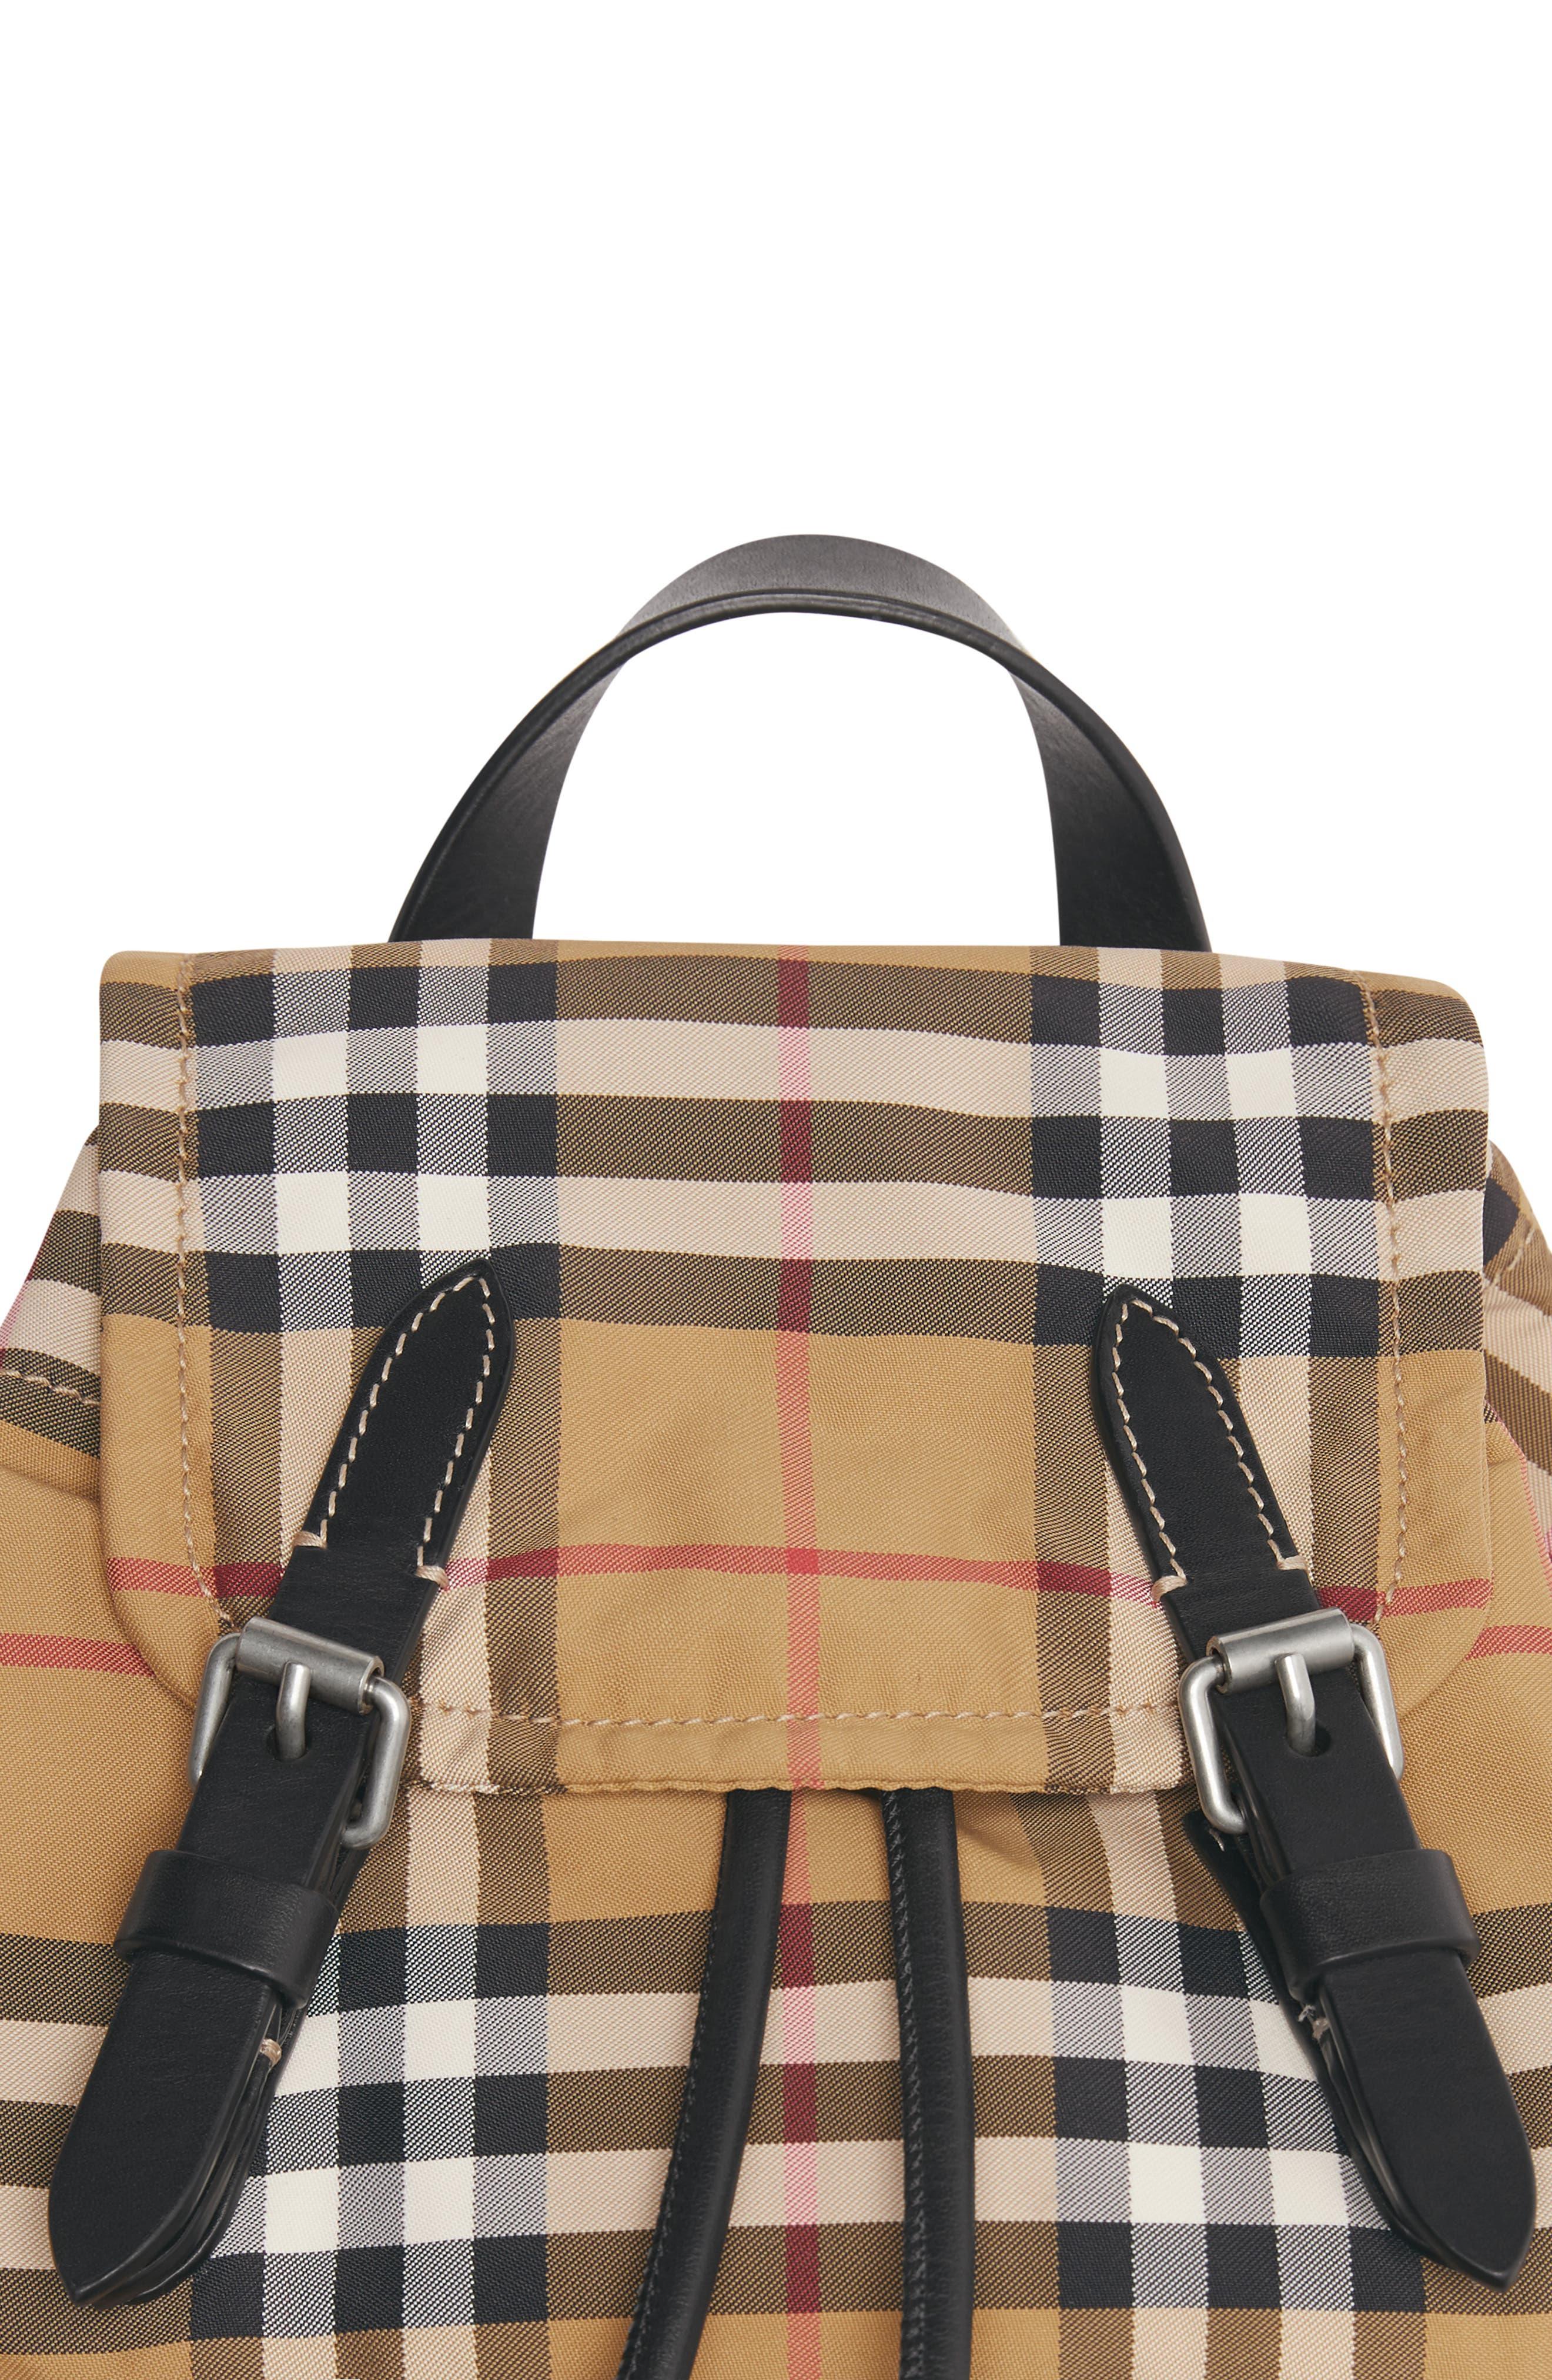 Small Rucksack Vintage Check Nylon Backpack,                             Alternate thumbnail 5, color,                             ANTIQUE YELLOW/ BLACK